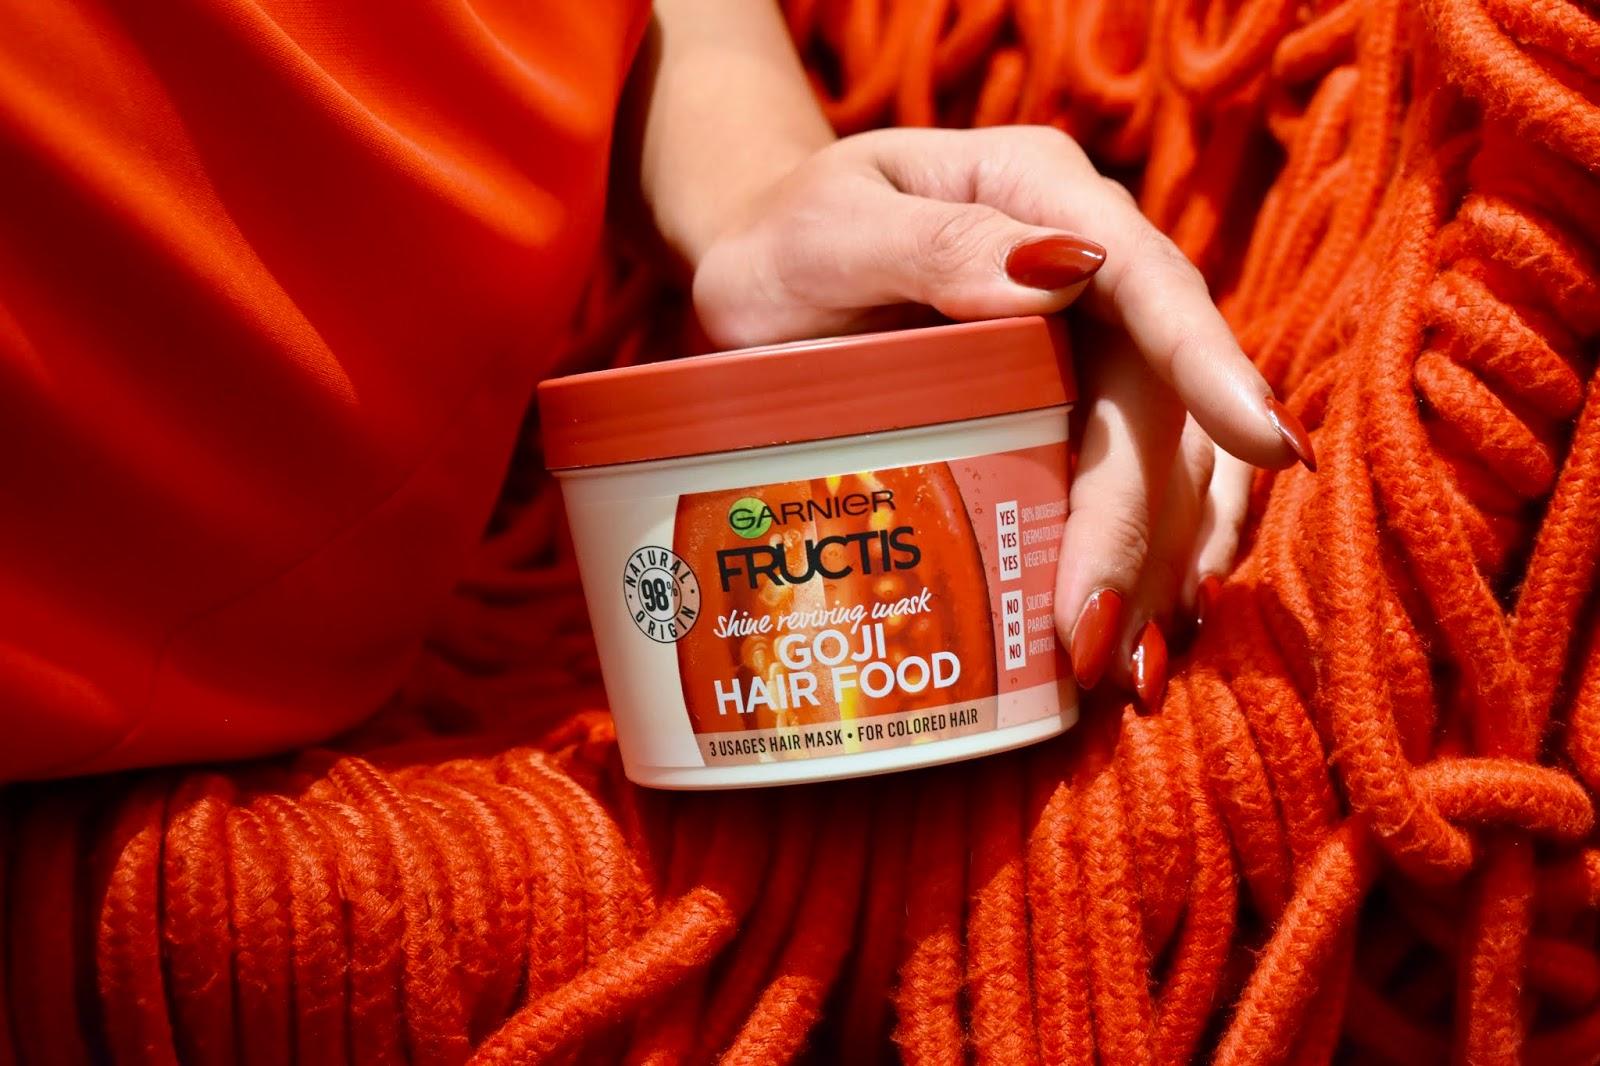 recensione maschere hair food notino